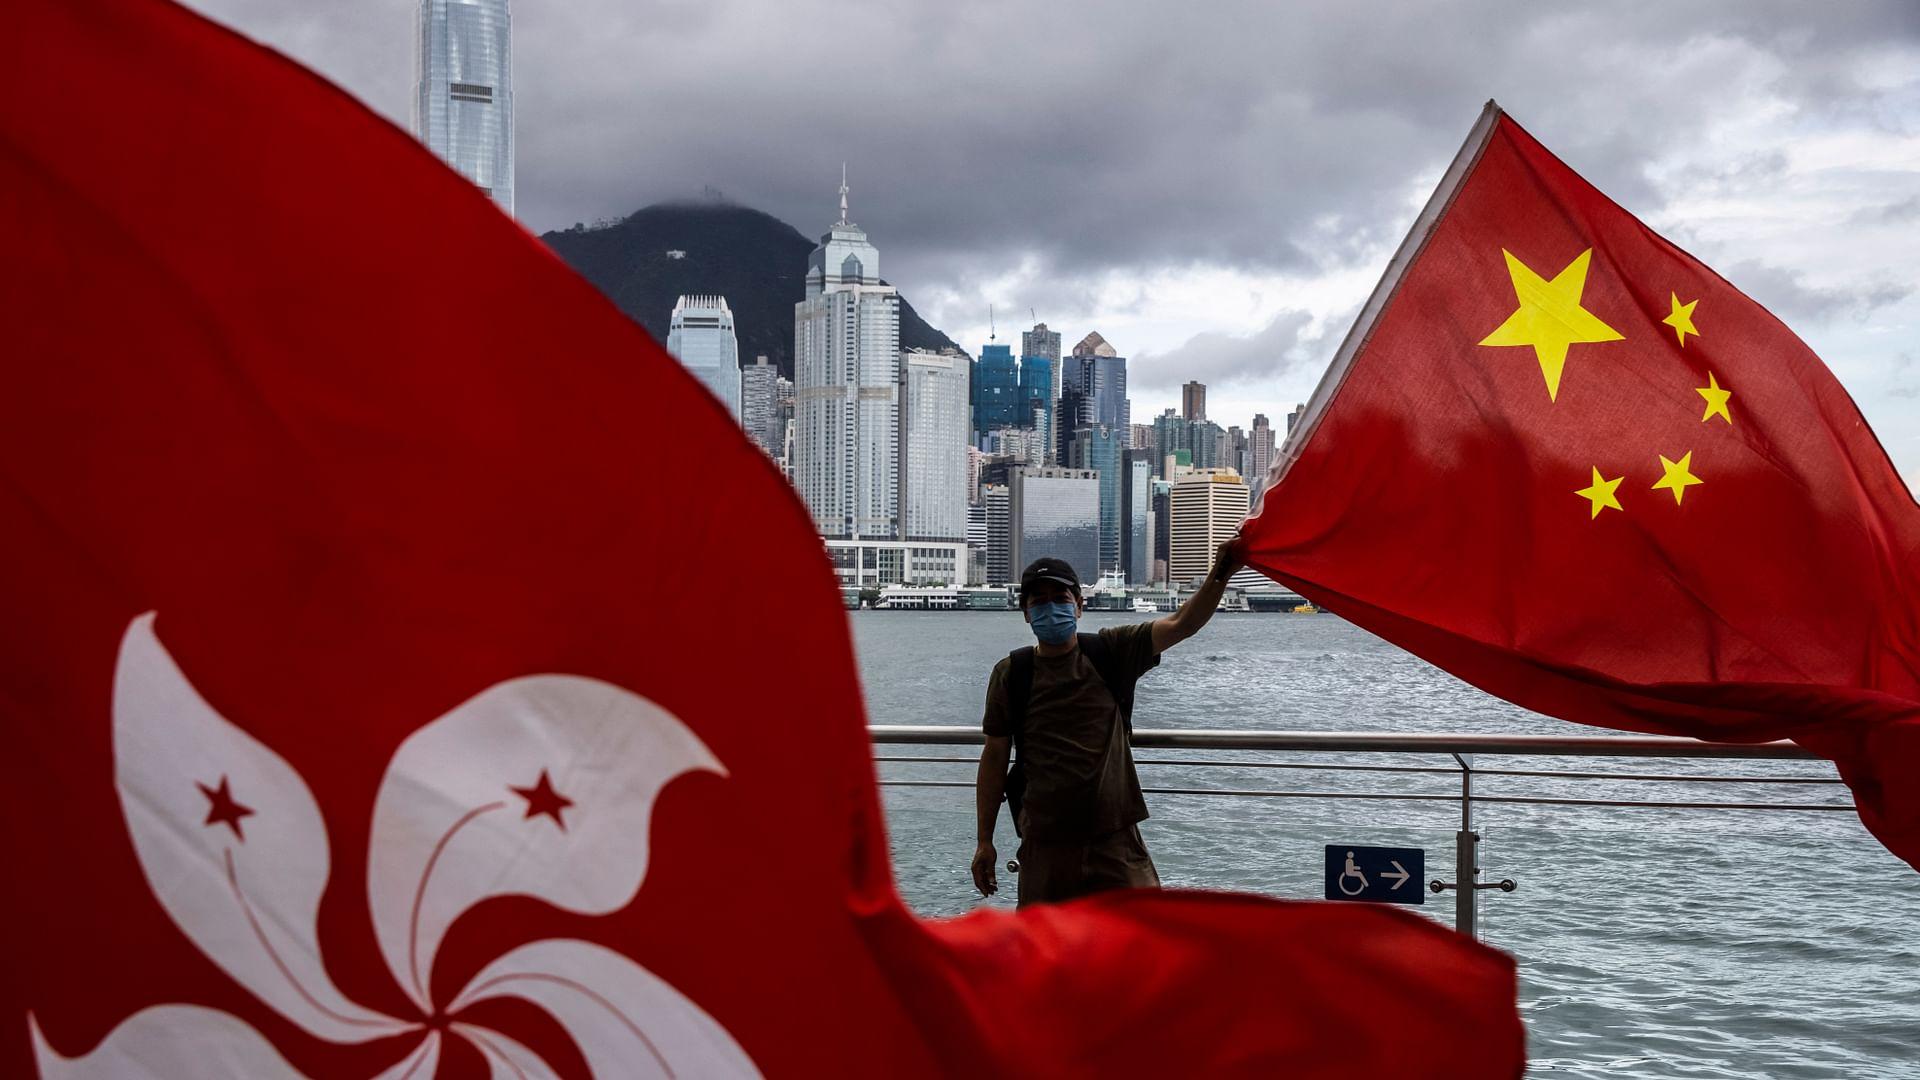 Hongkong: Mehr Repression statt Demokratie